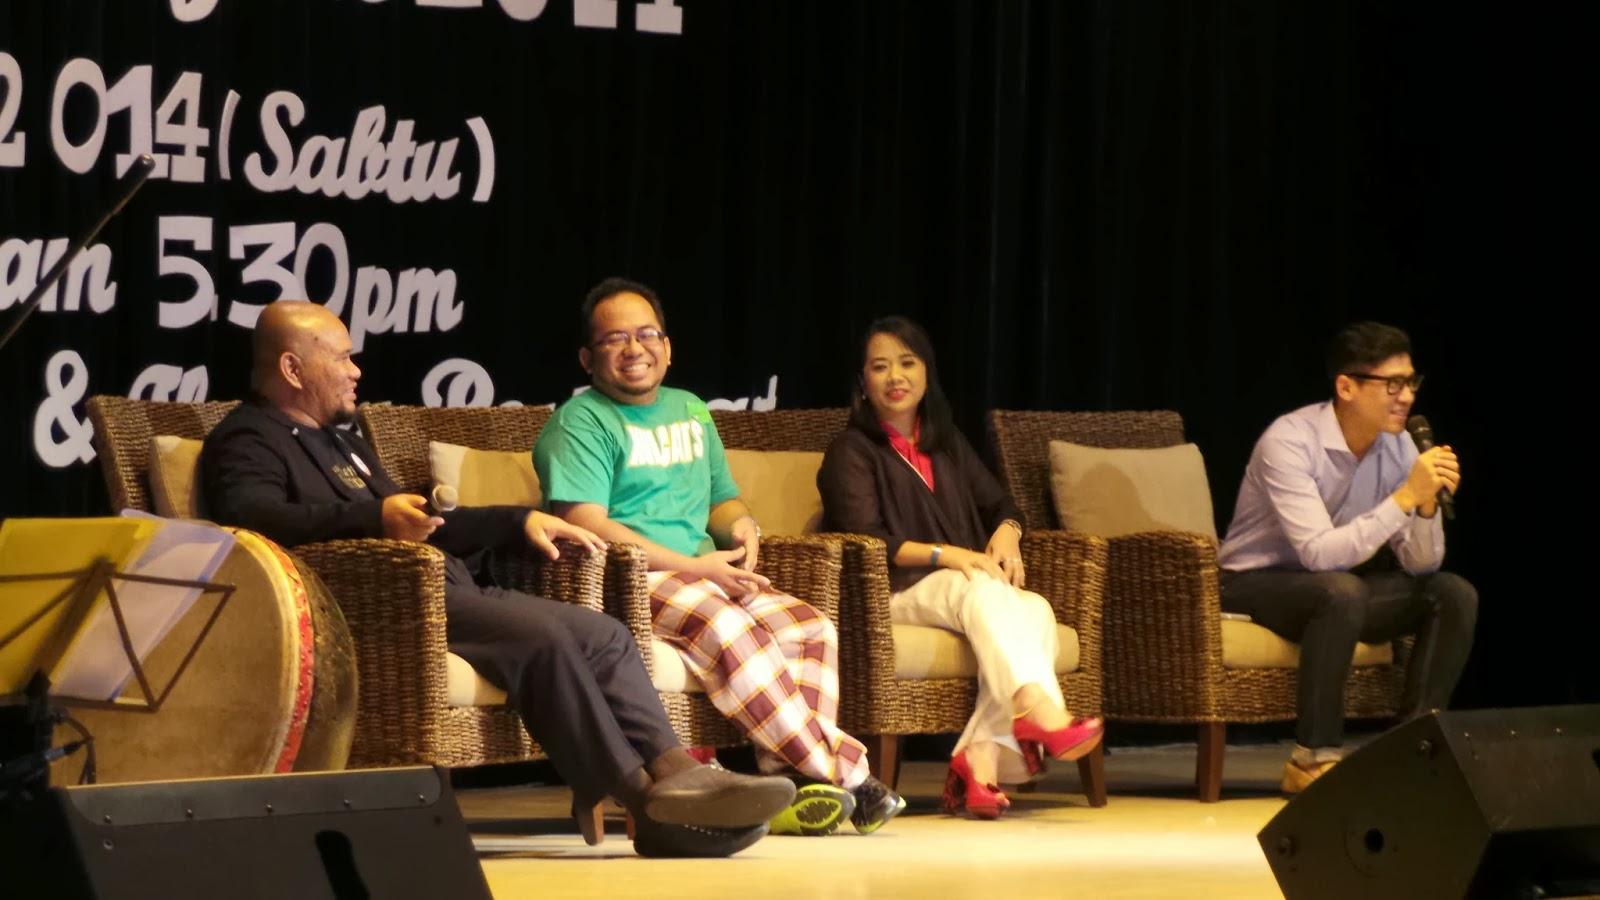 Sahabat Zarul Umbrella dalam satu event blogger